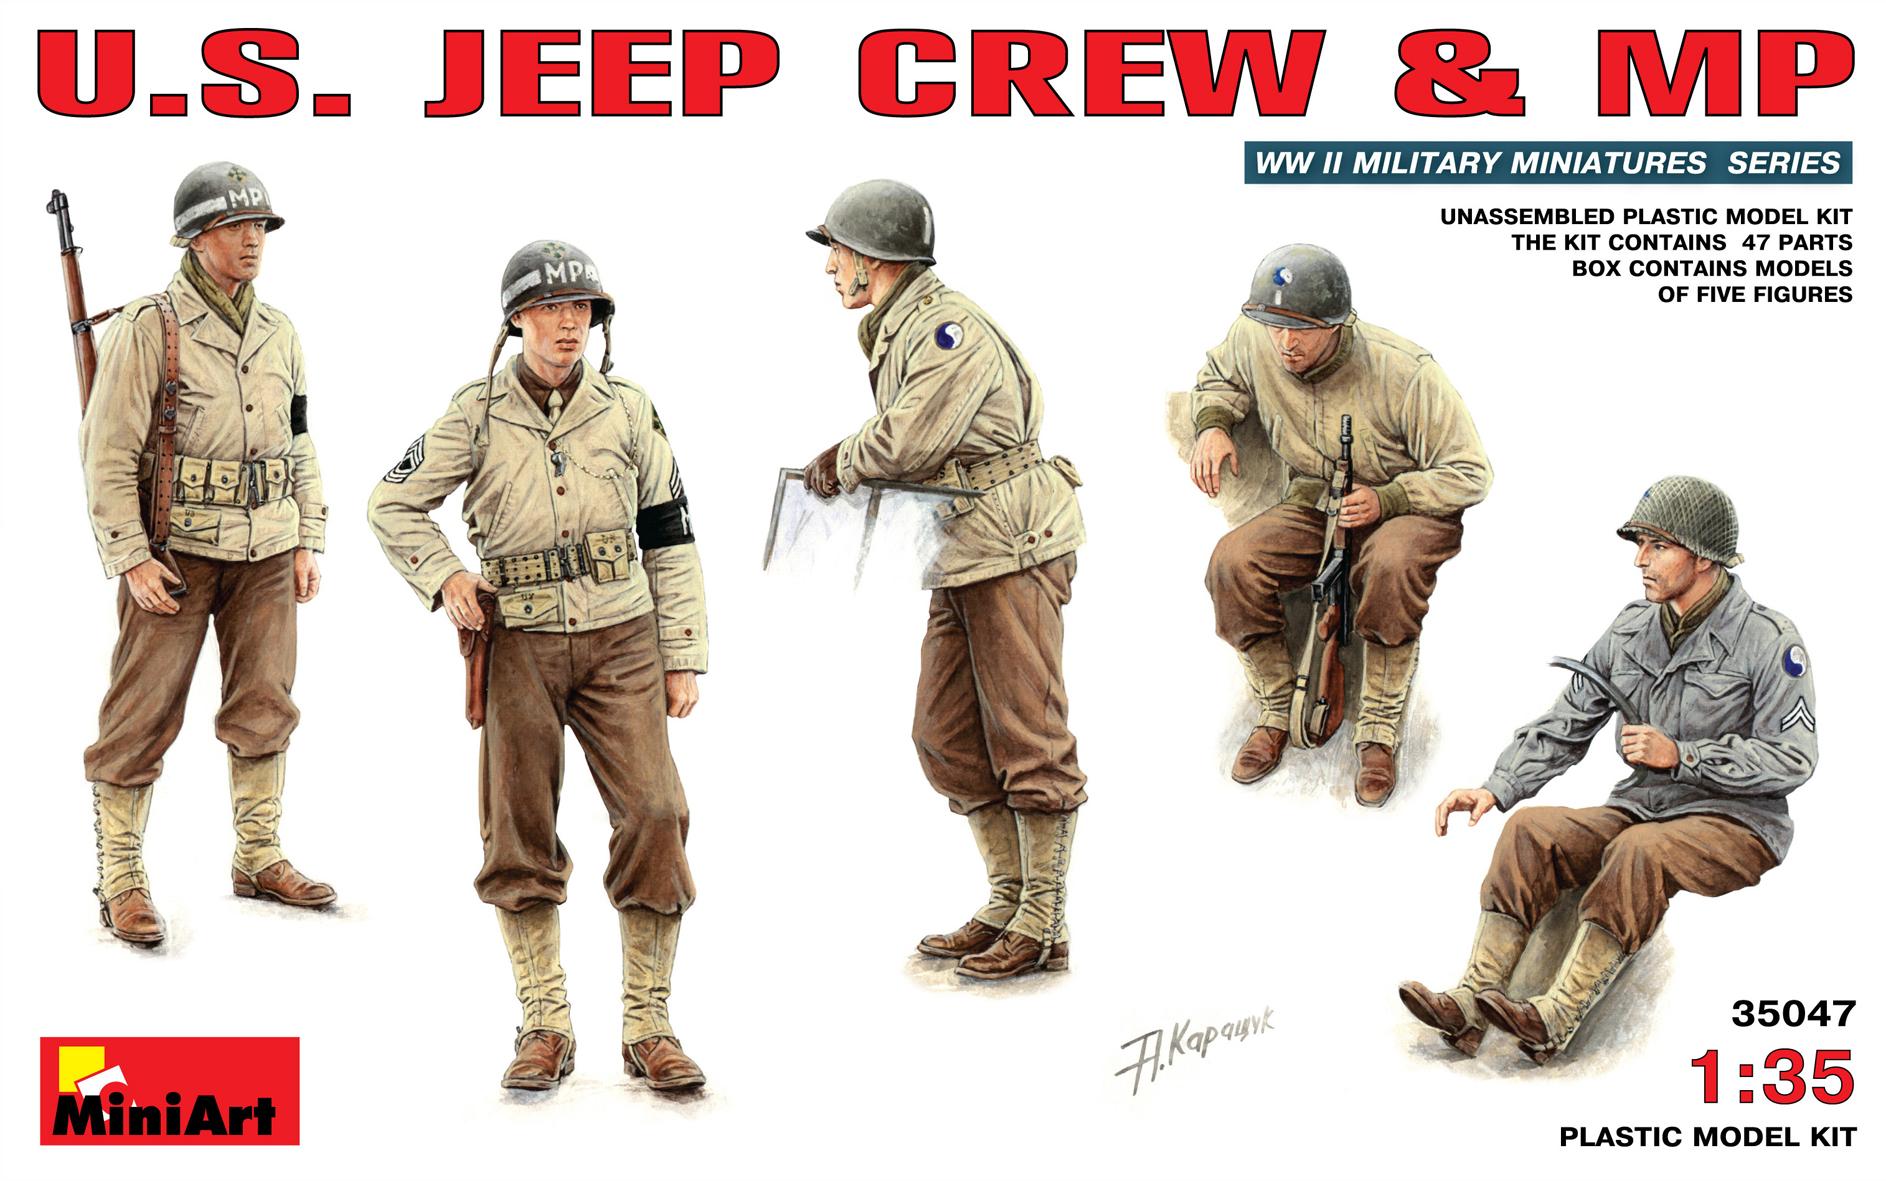 35047 U.S. JEEP CREW & MP